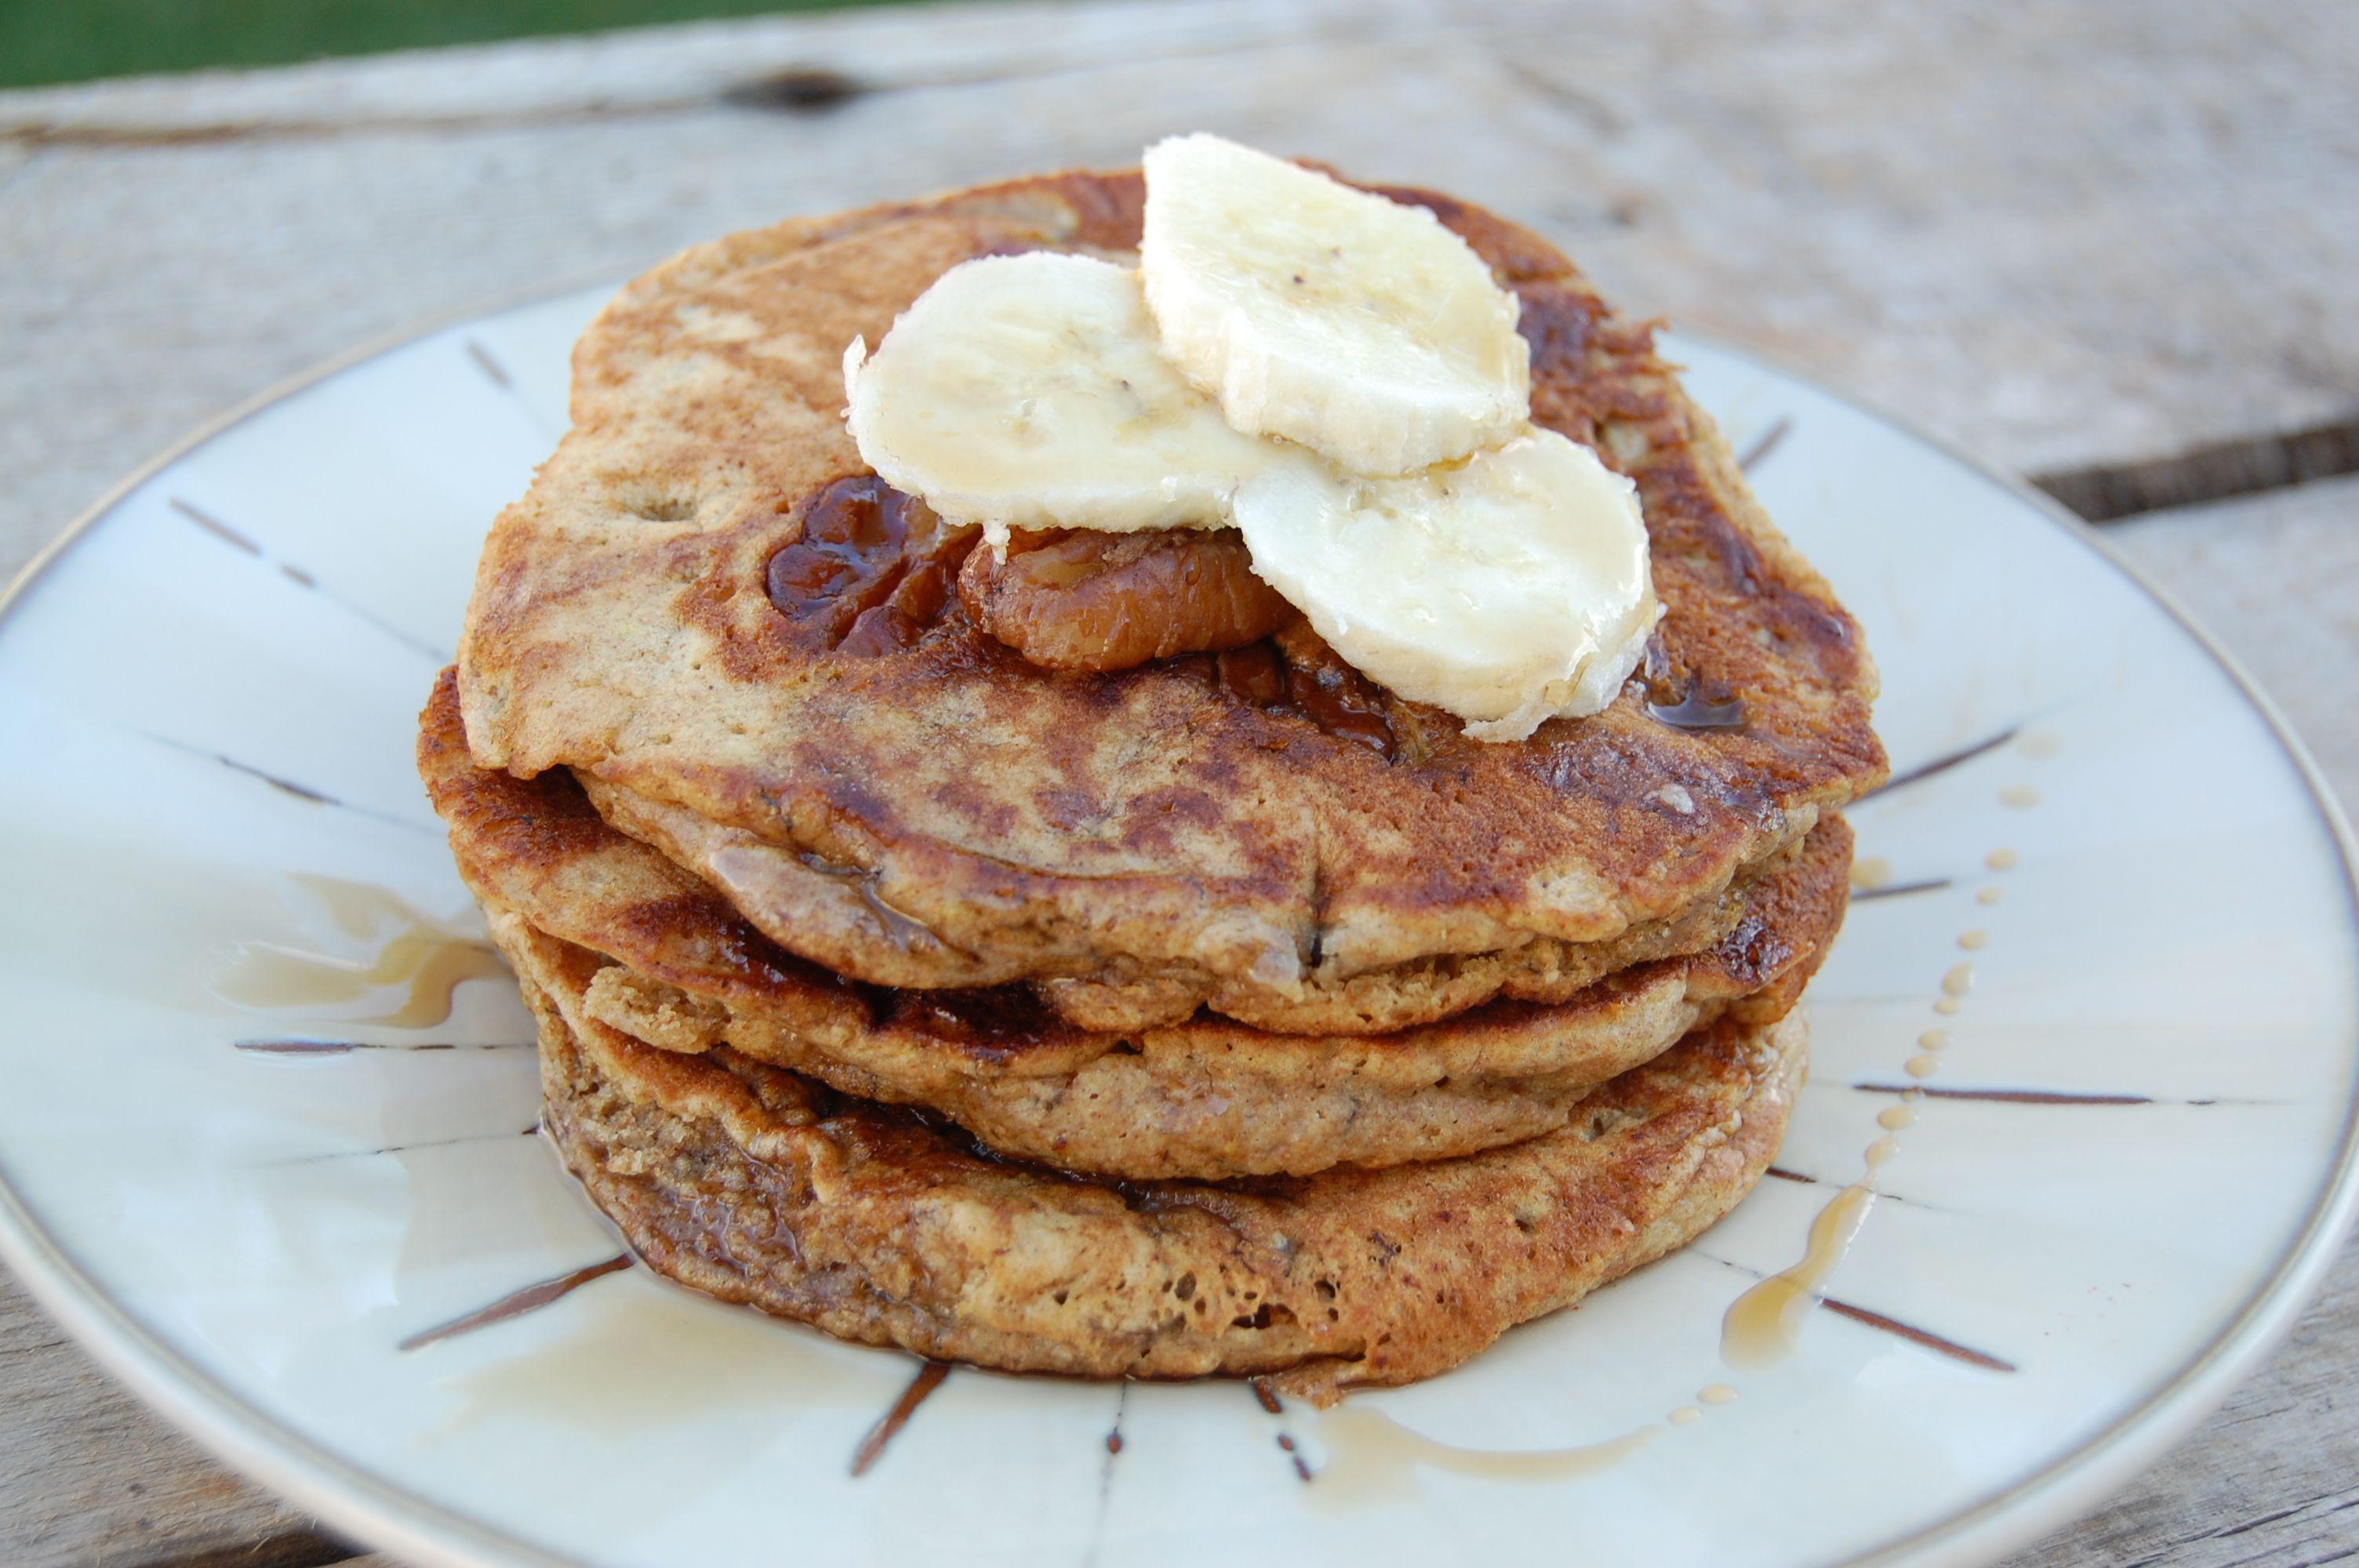 Recipe: Whole-Wheat Banana Pancakes